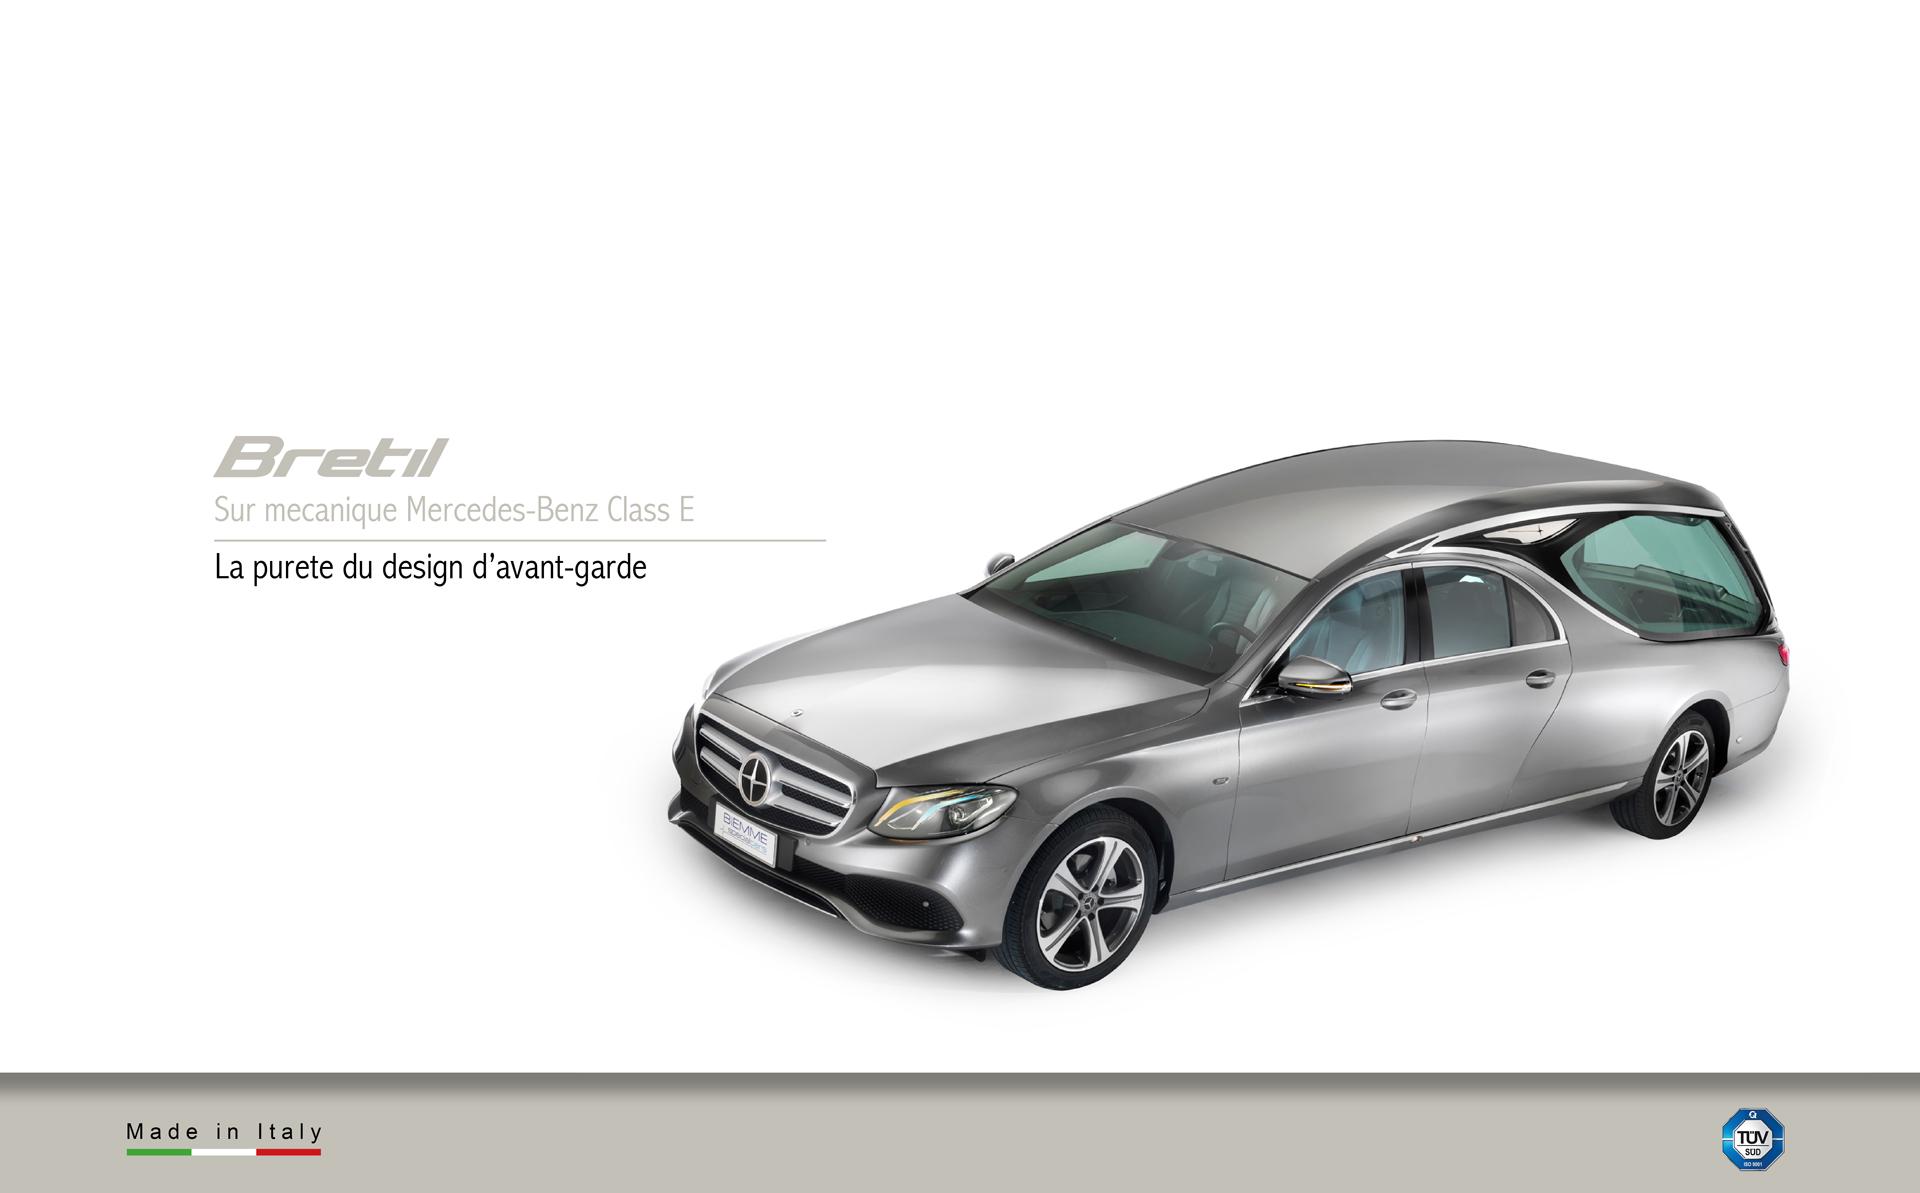 Corbillard sur mecanique Mercedes-Benz E Class